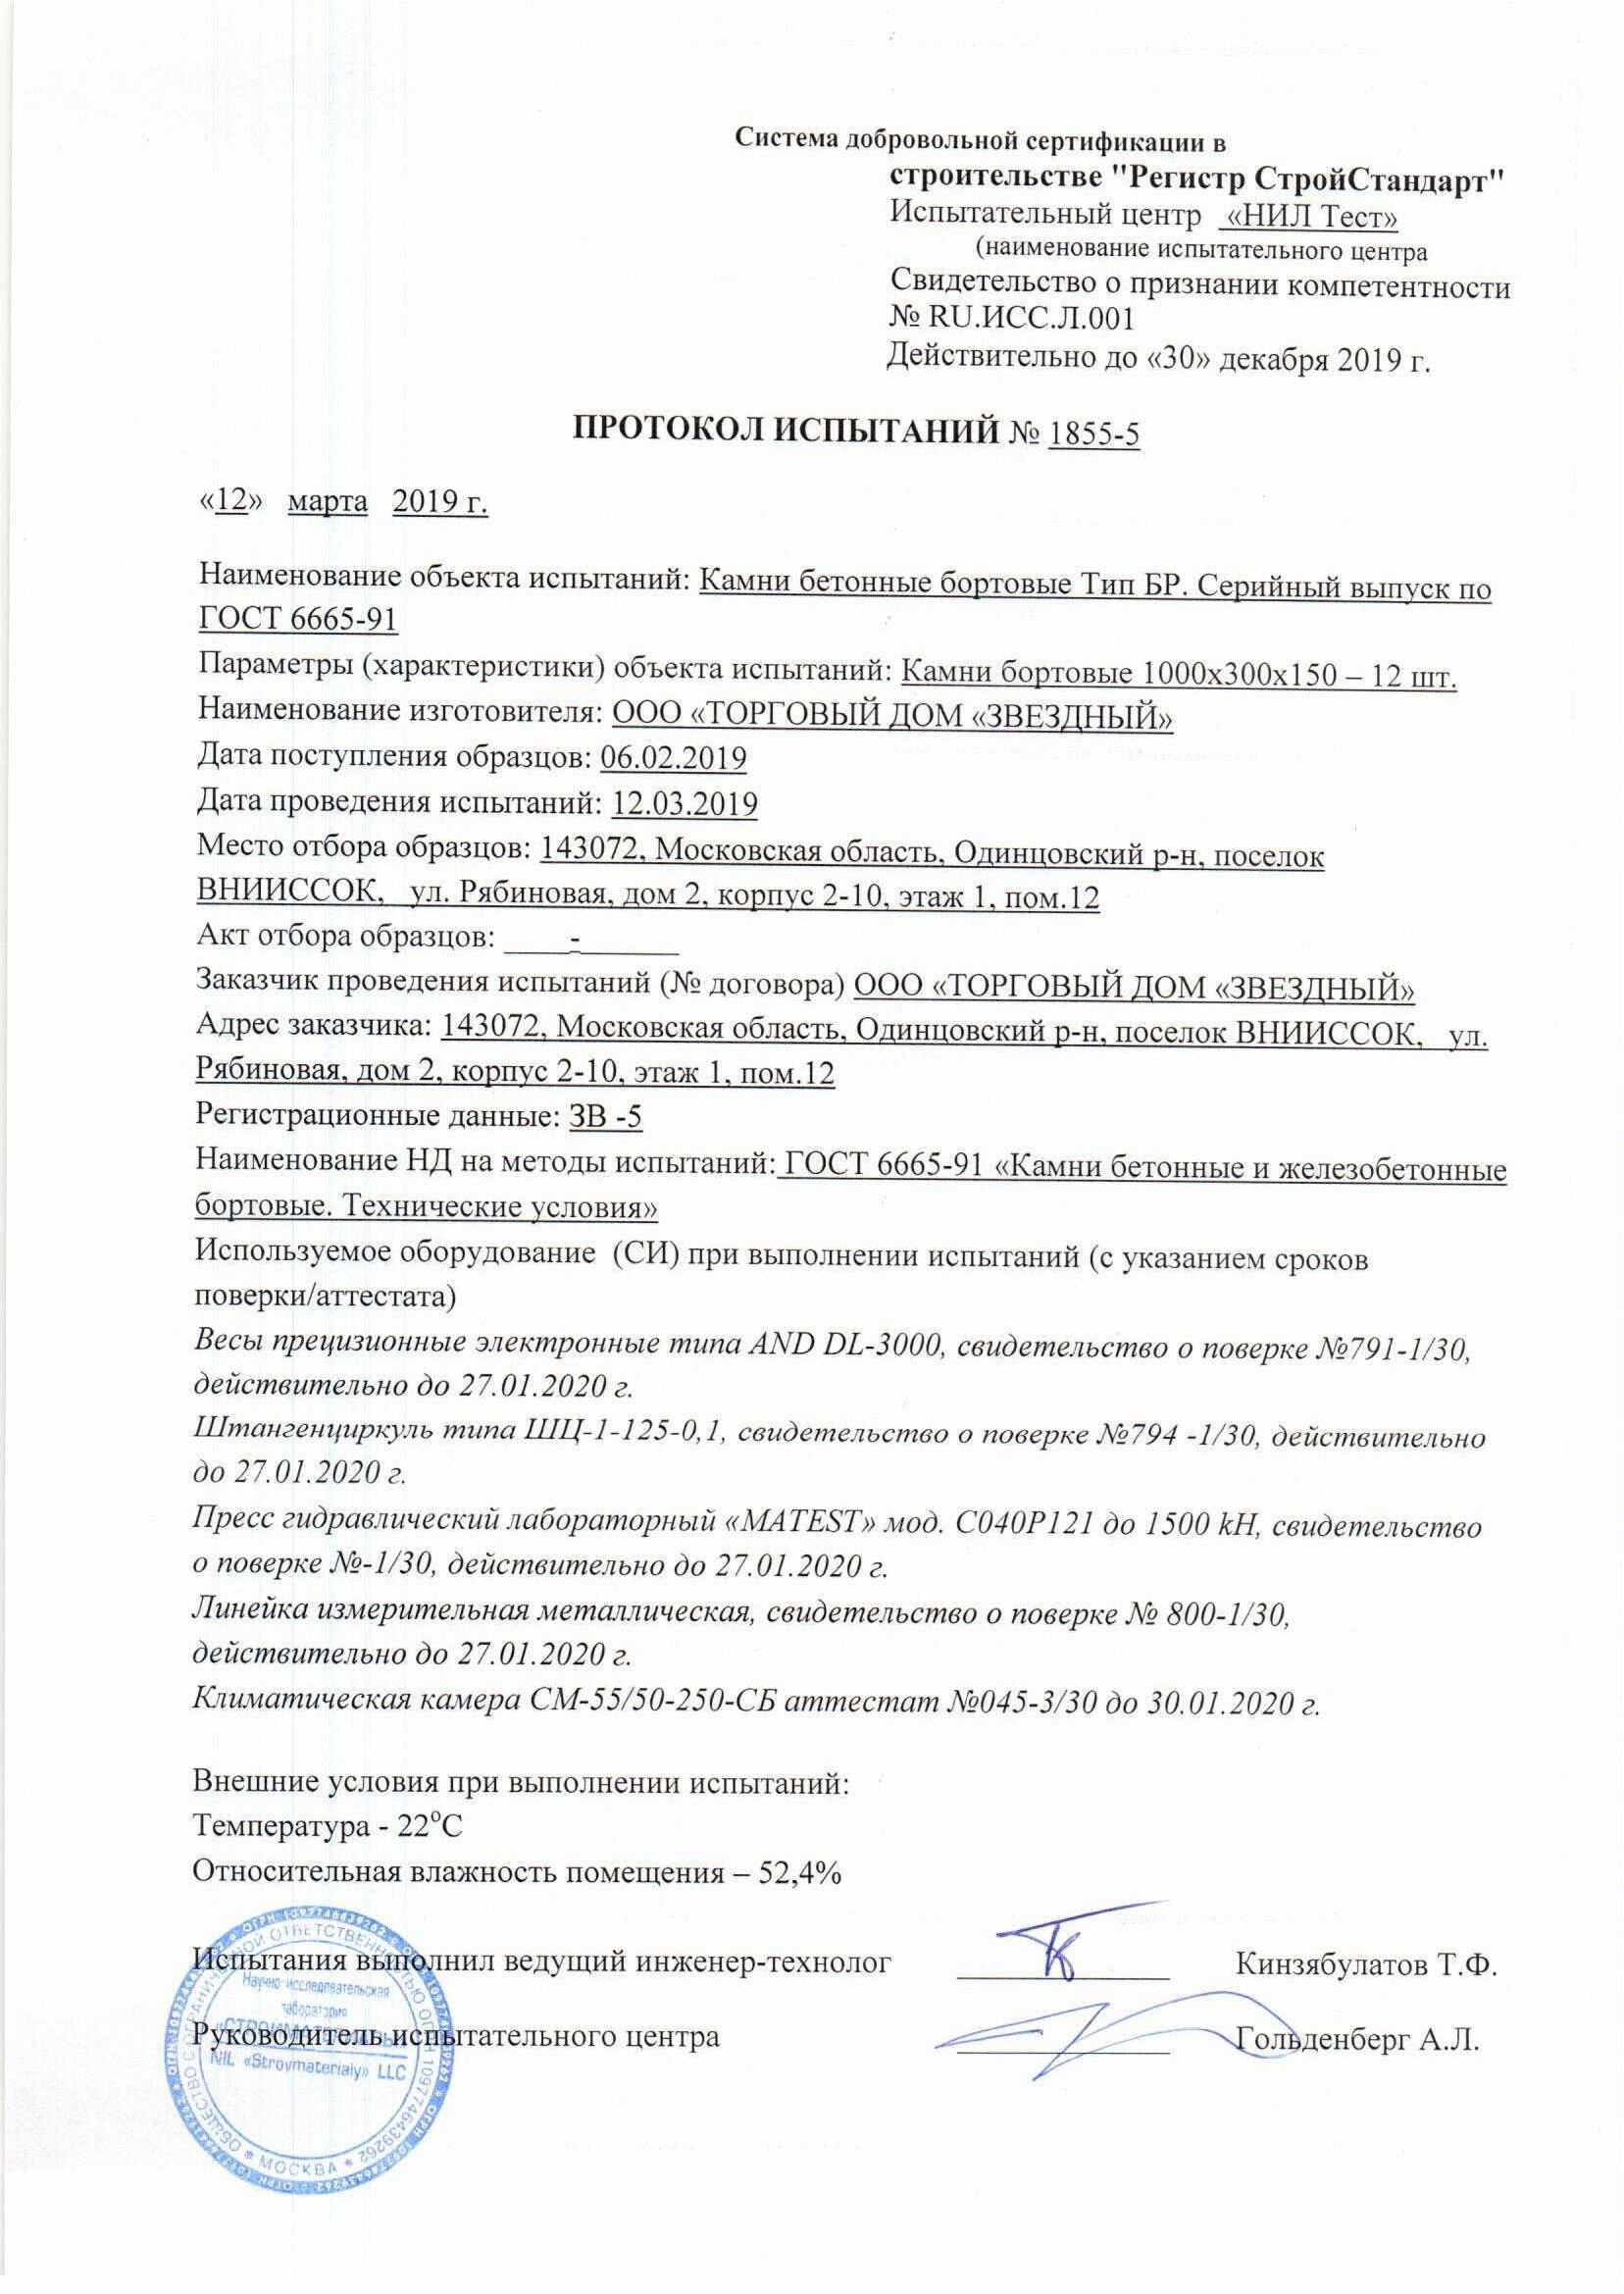 Протокол_испытаний_на_бордюр_100.30.15.jpg